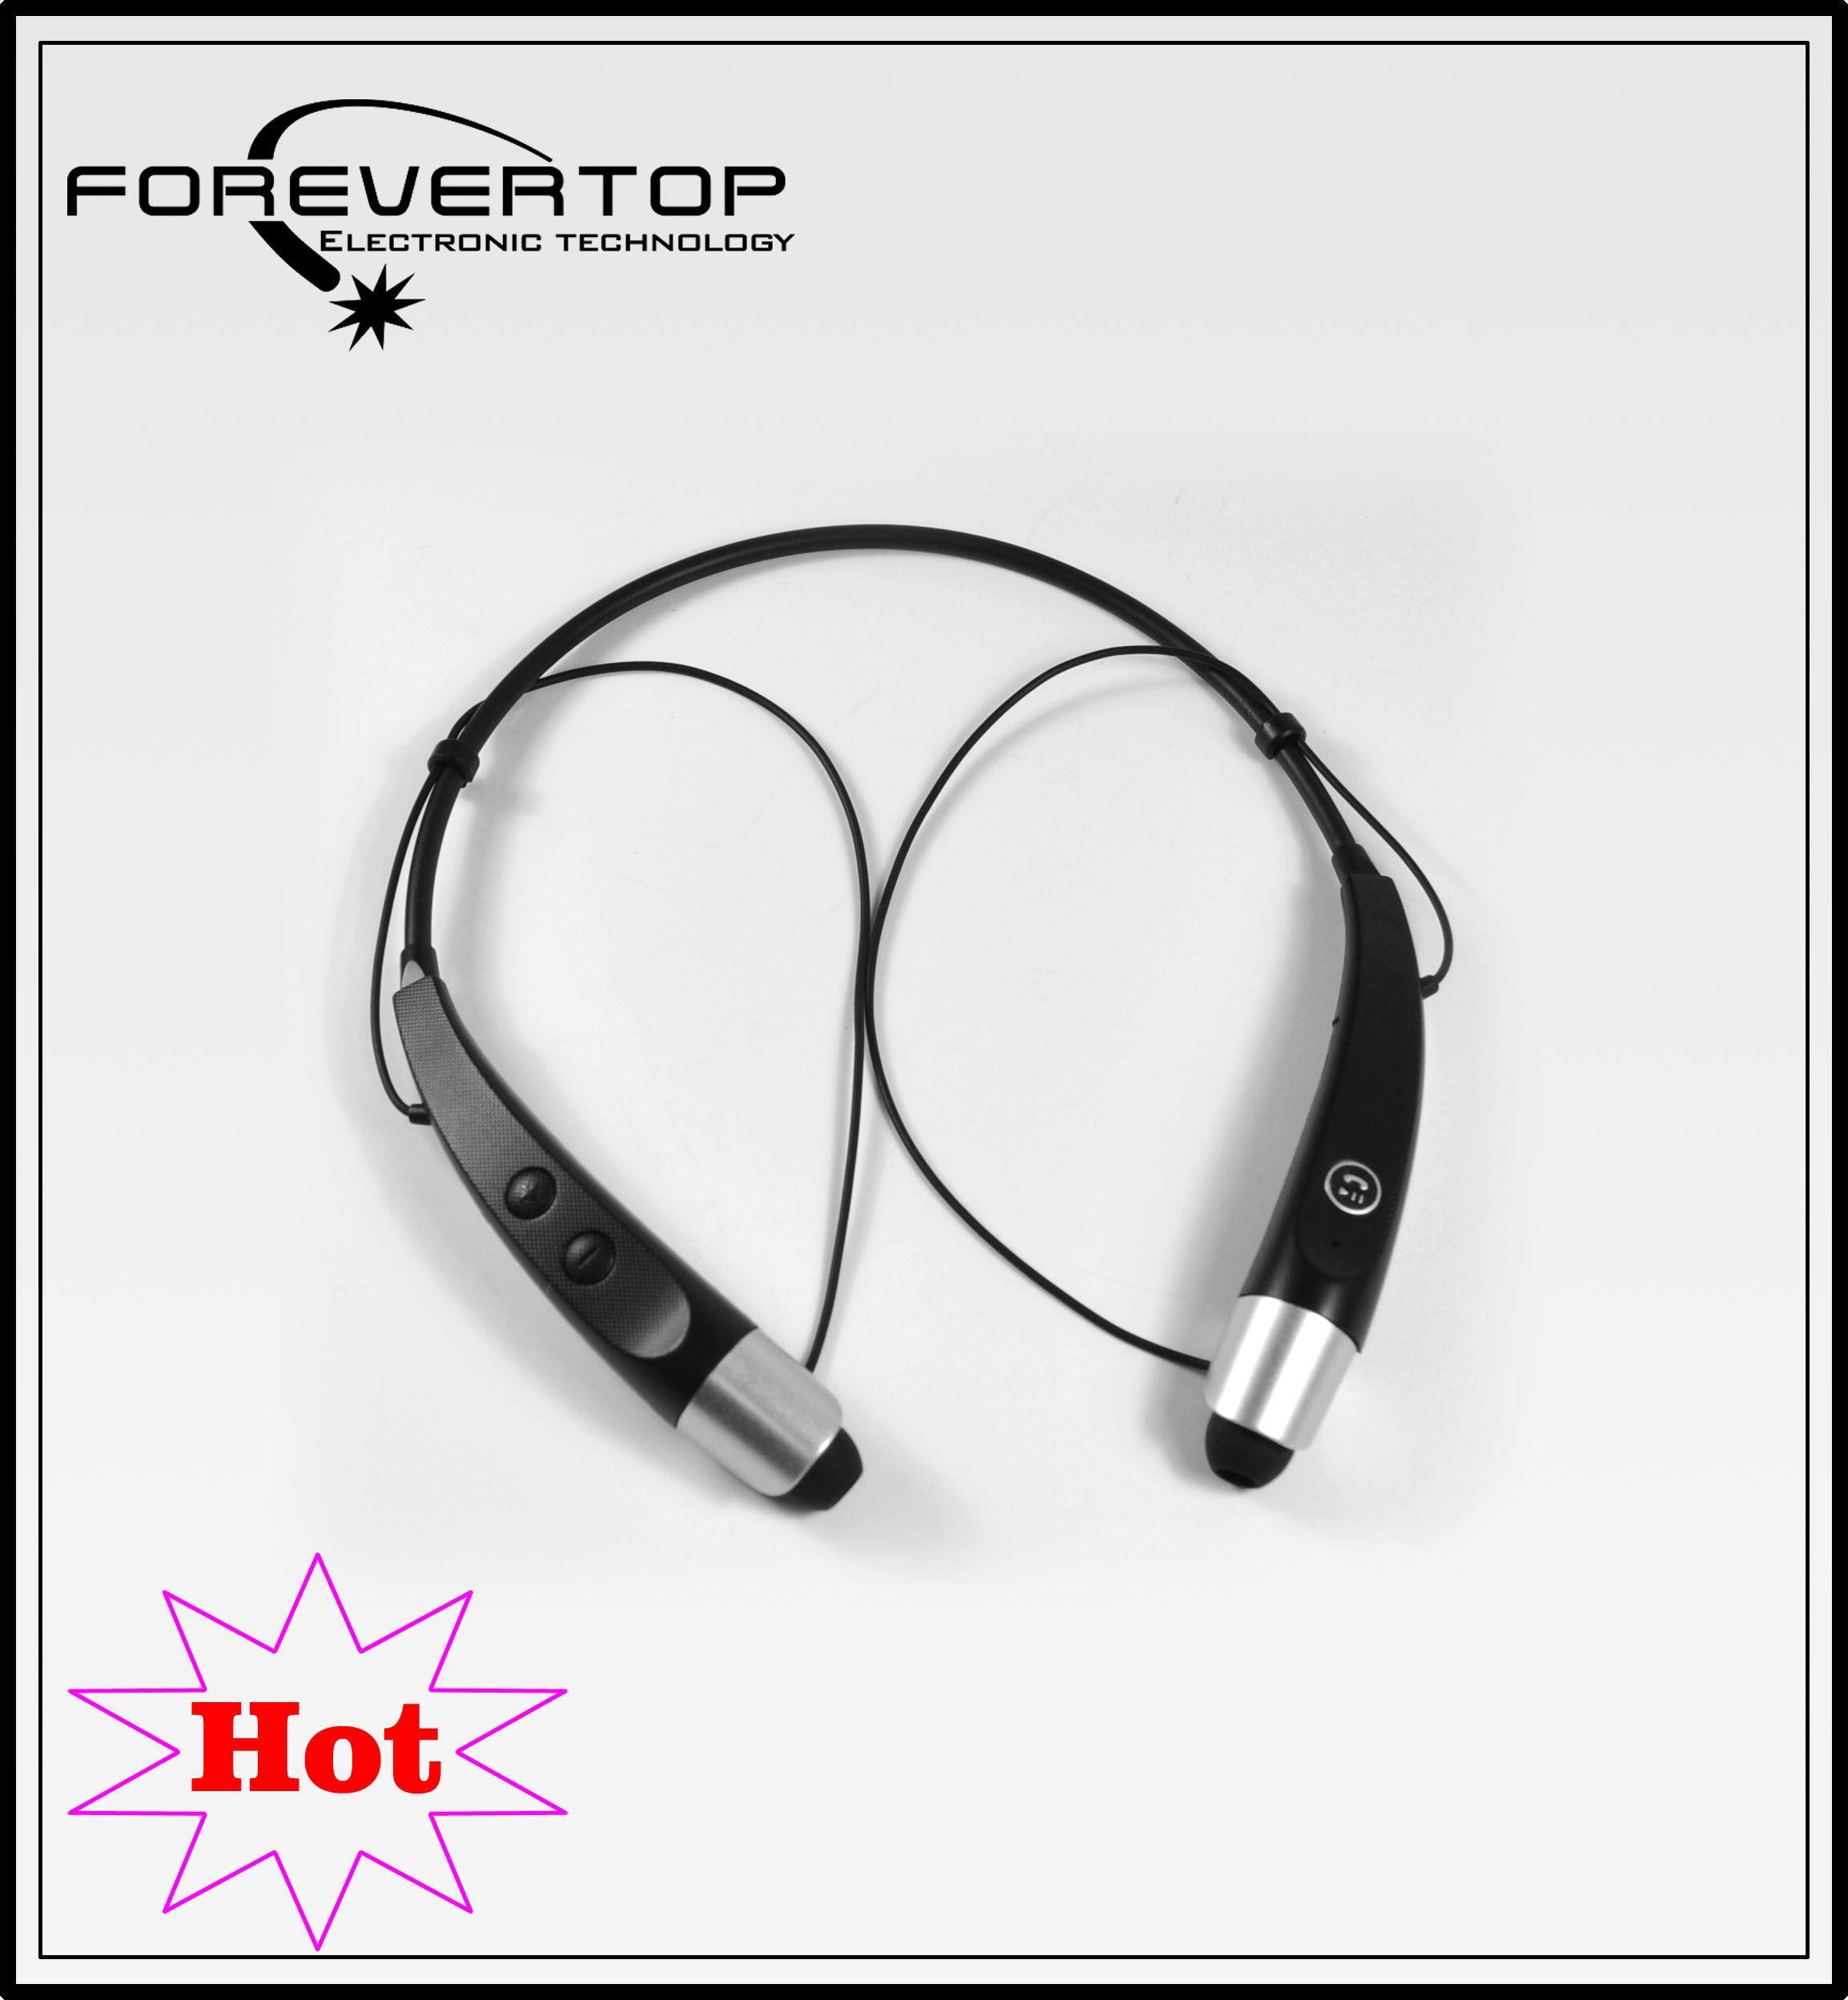 Walkie Talkie With Bluetooth Headset 2016 Hot Selling Wireless Super Mini &  Micro Bluetooth Earphone Waterproof Bluetooth Hbs500 Headphones Best  Running